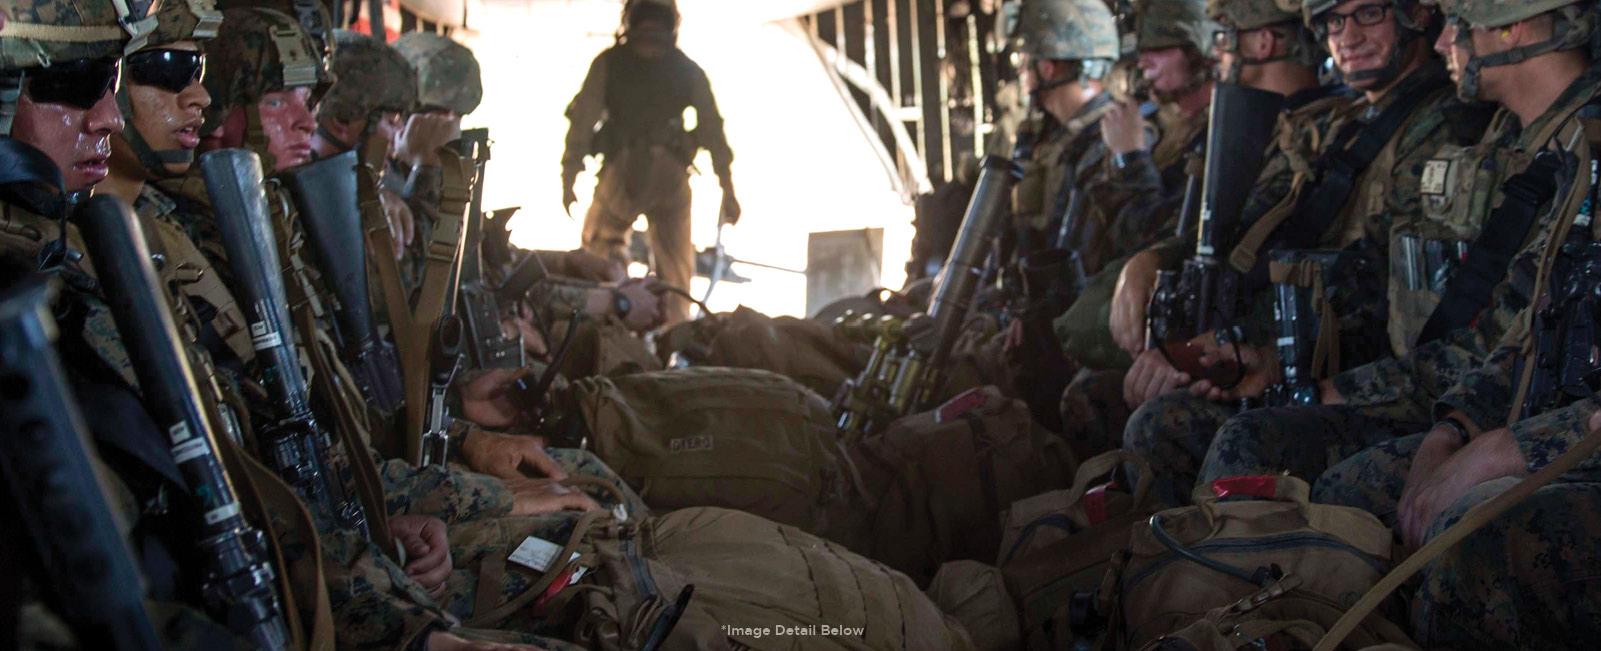 Marines on Osprey